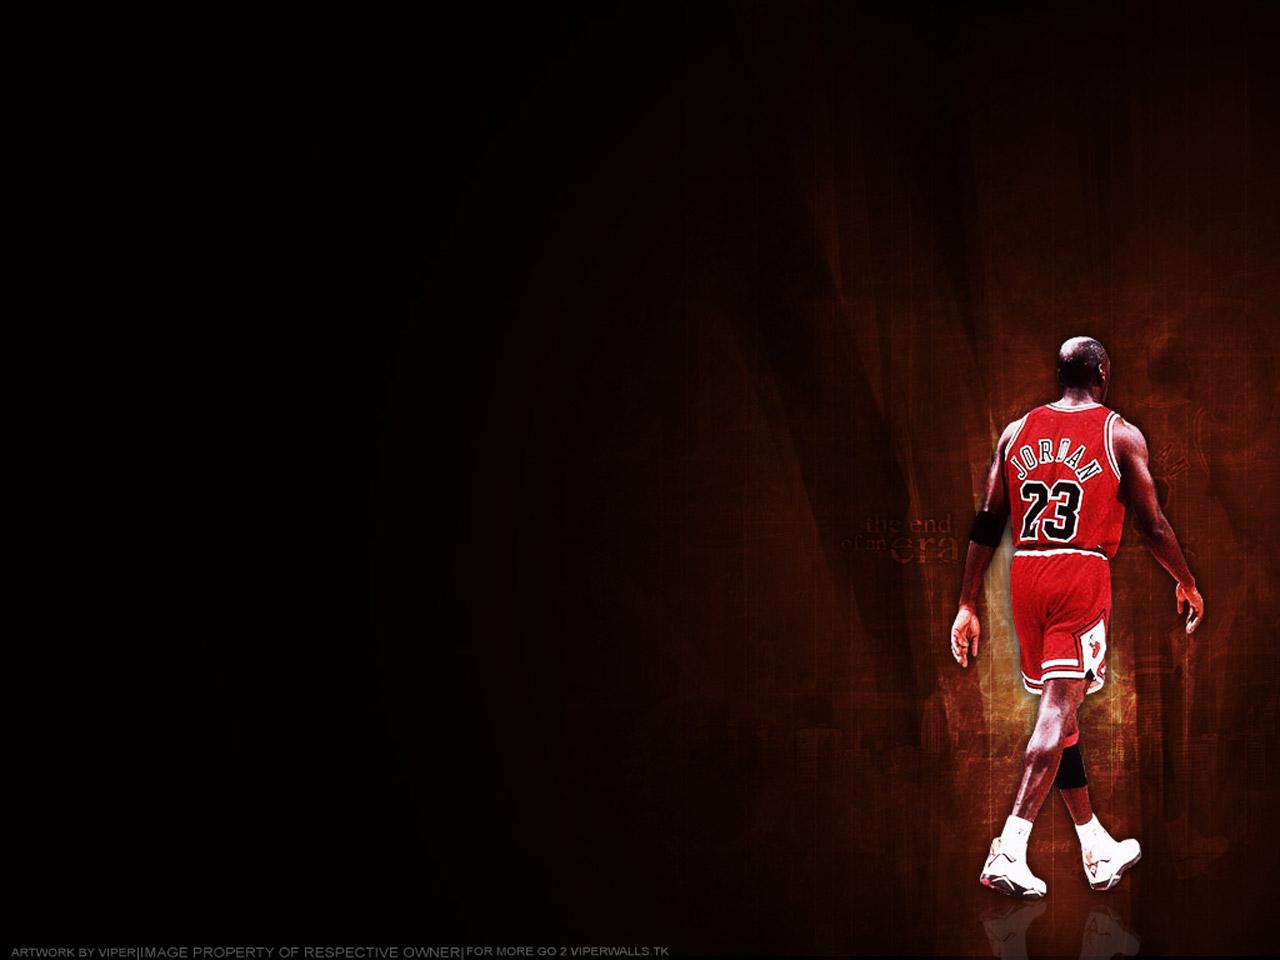 Michael Jordan HD WALLPAPERS HD WALLPAPERS 1280x960